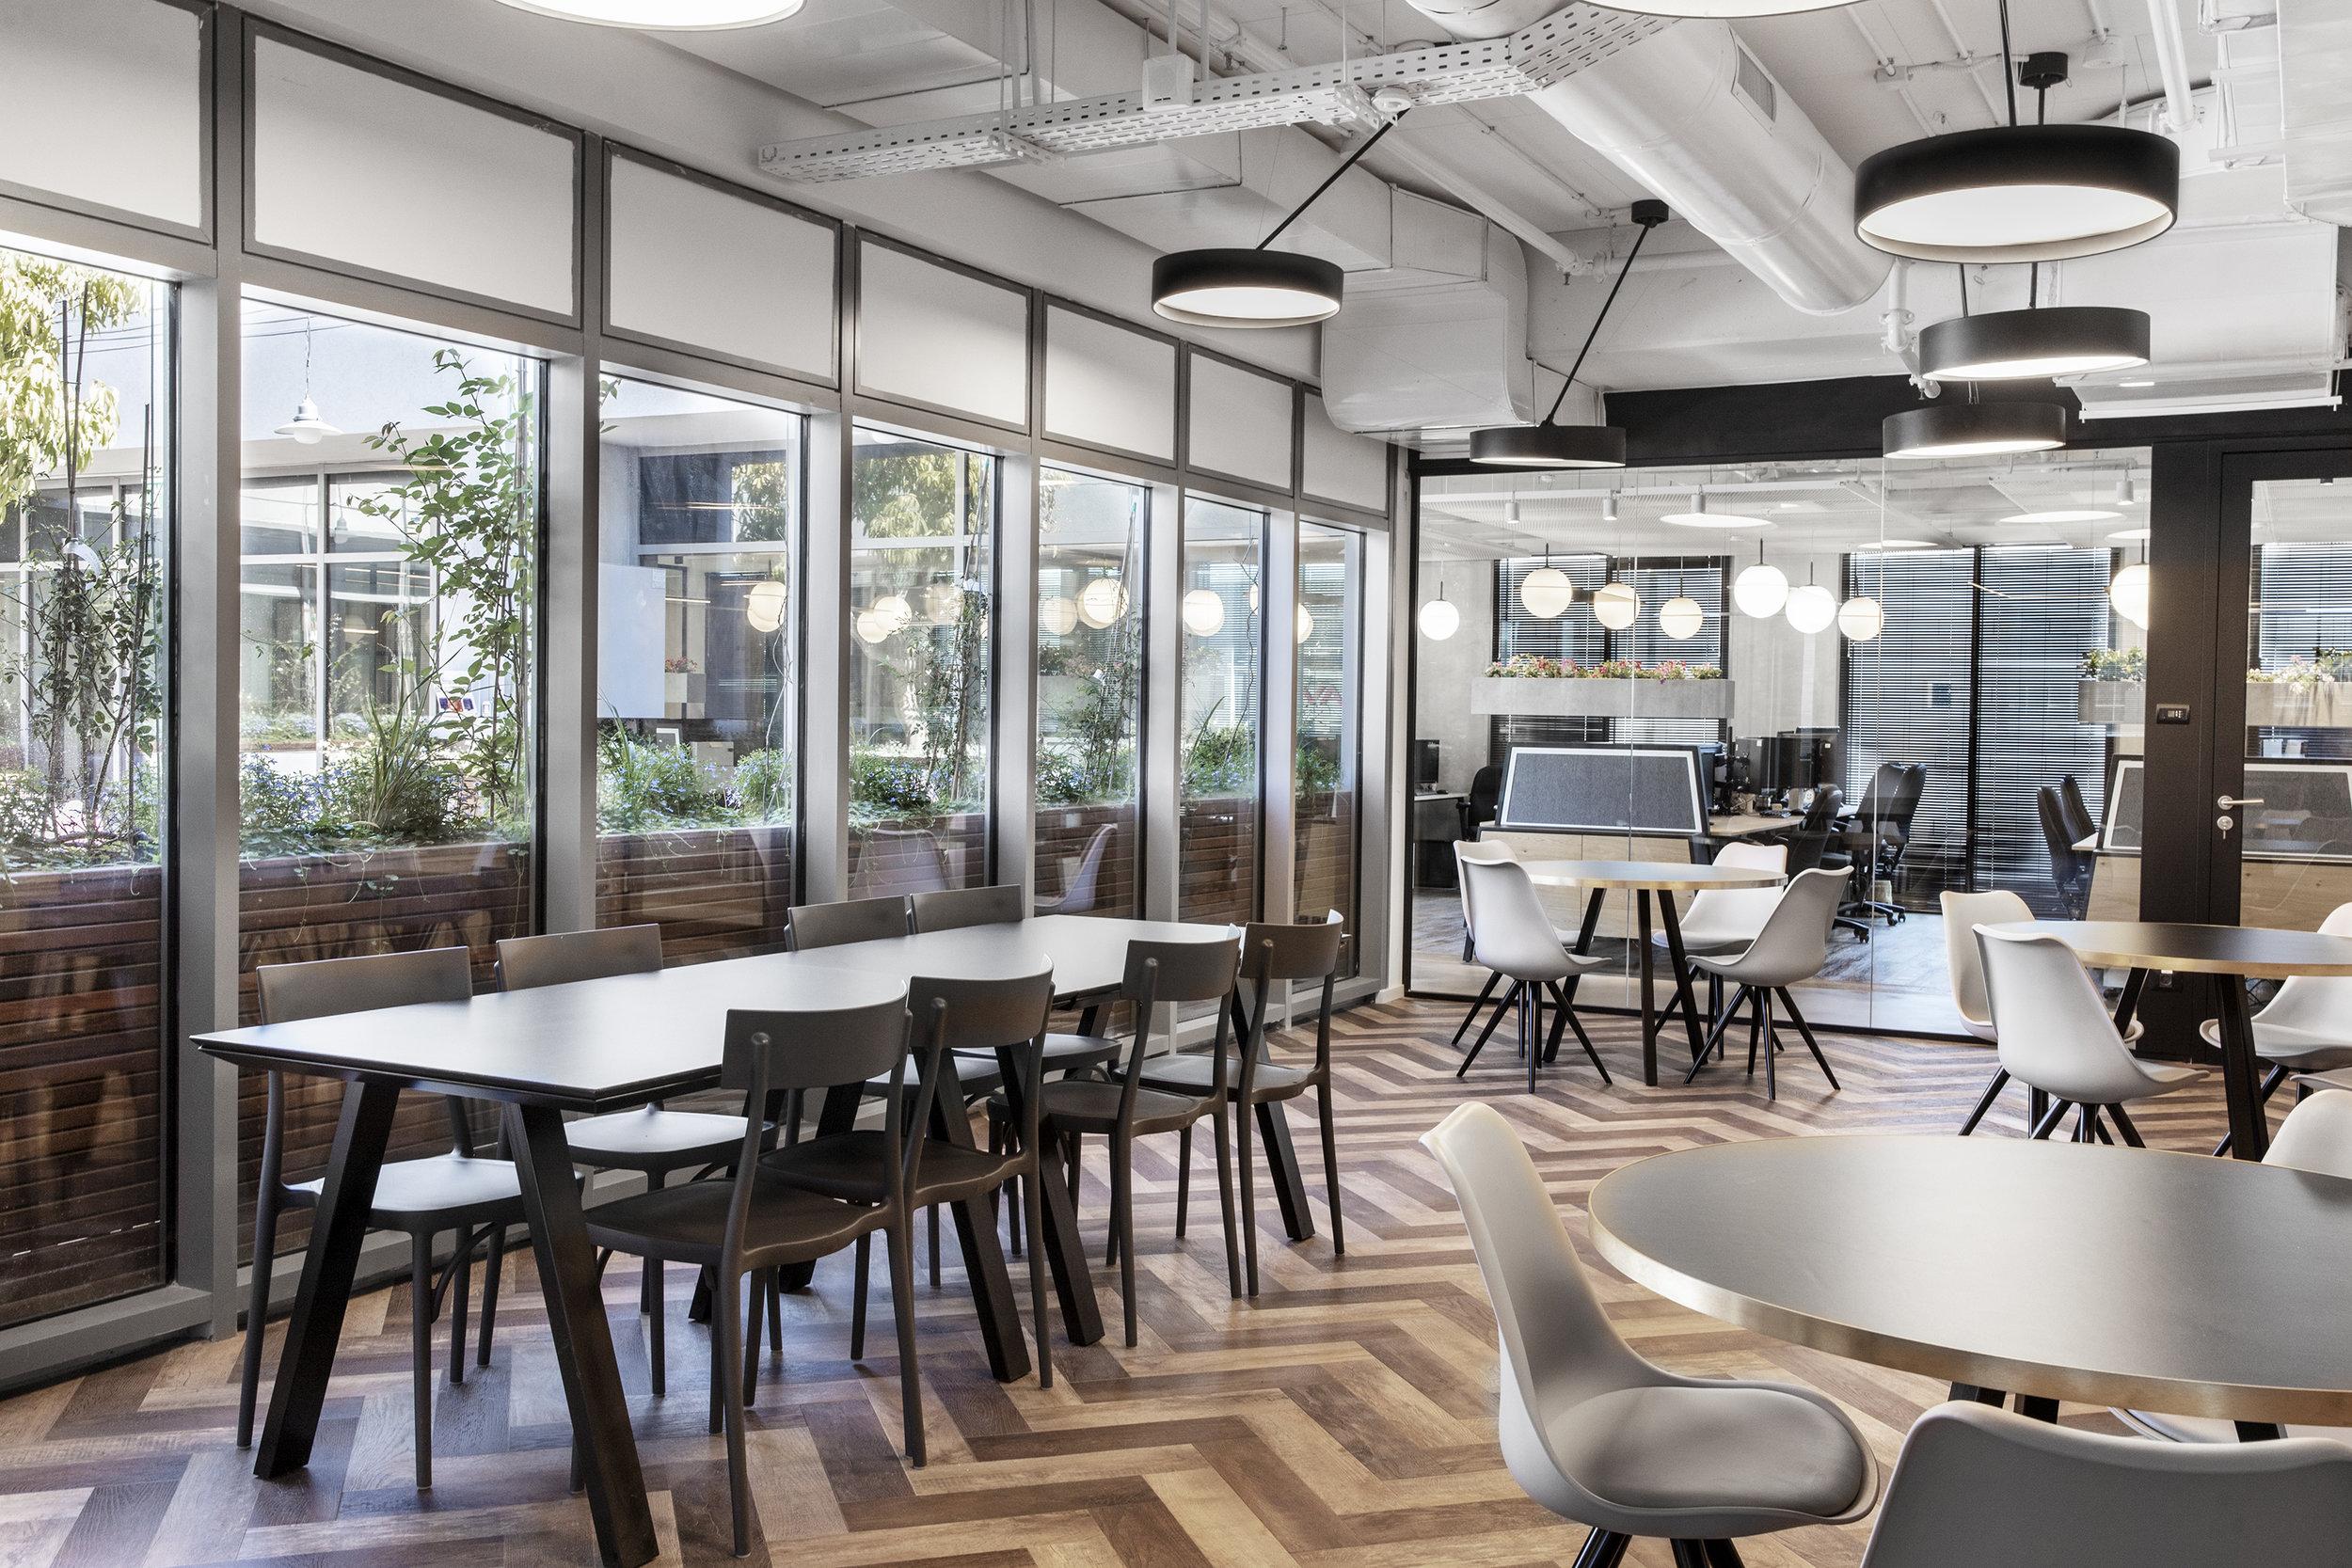 R2NET OFFICES - ROY DAVID ARCHITECTURE  STUDIO - רואי דוד אדריכלות סטודיו אדריכלים - אר2נט (24).jpg